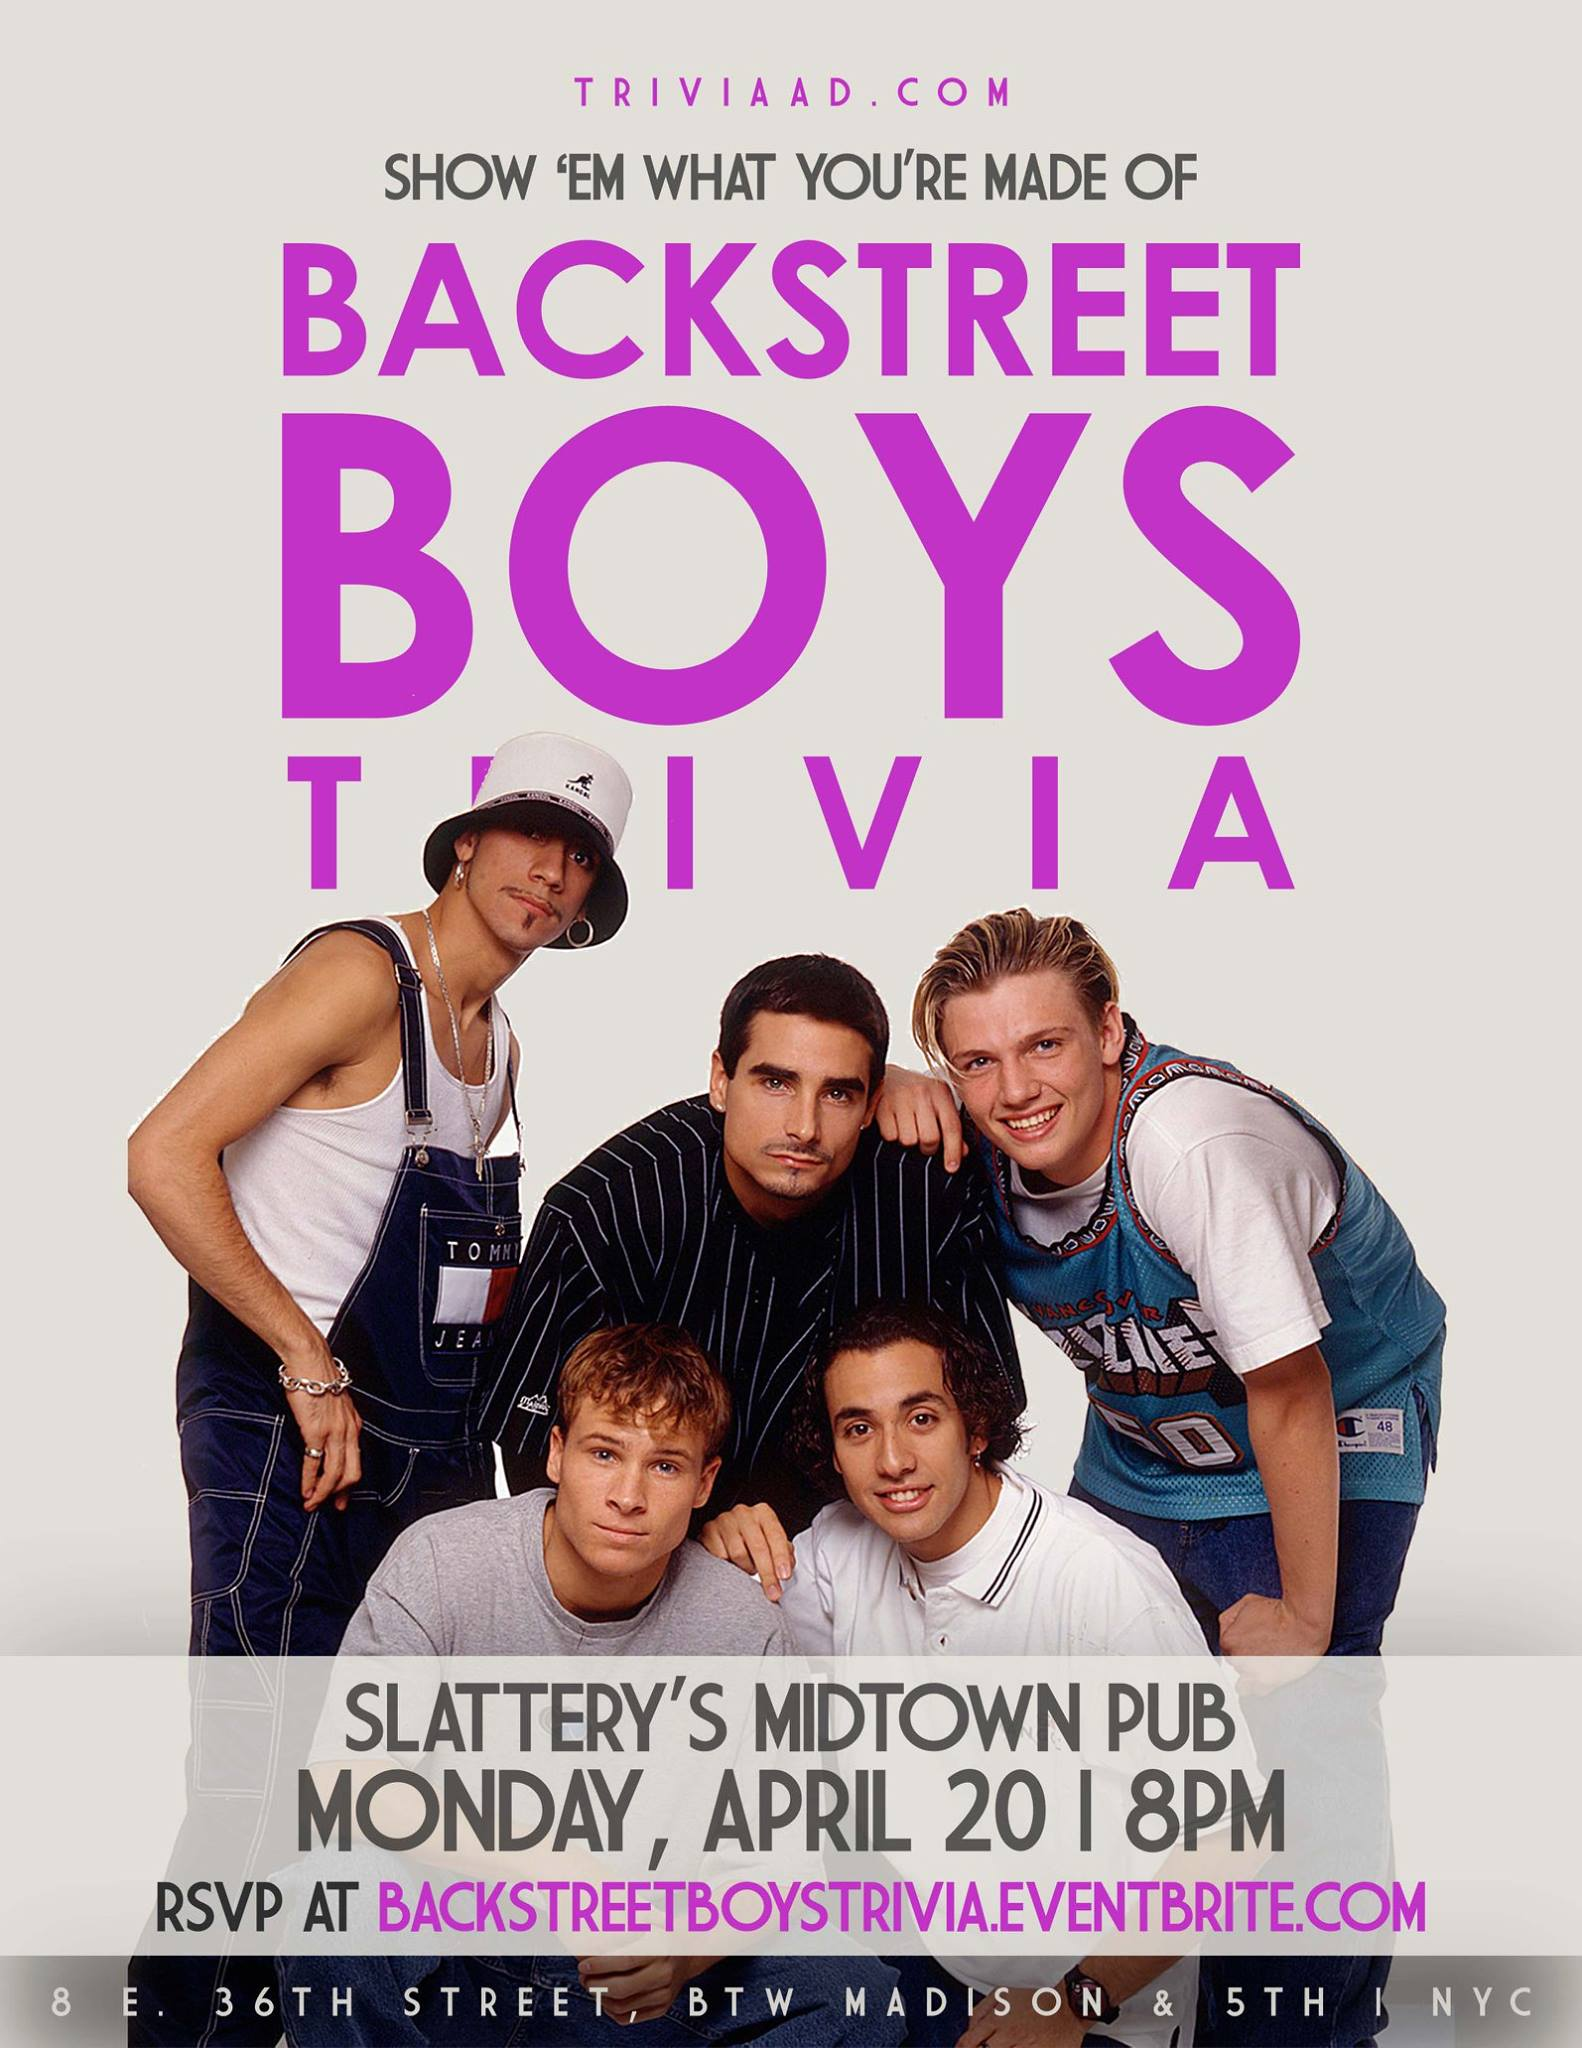 Backstreet Boys Trivia